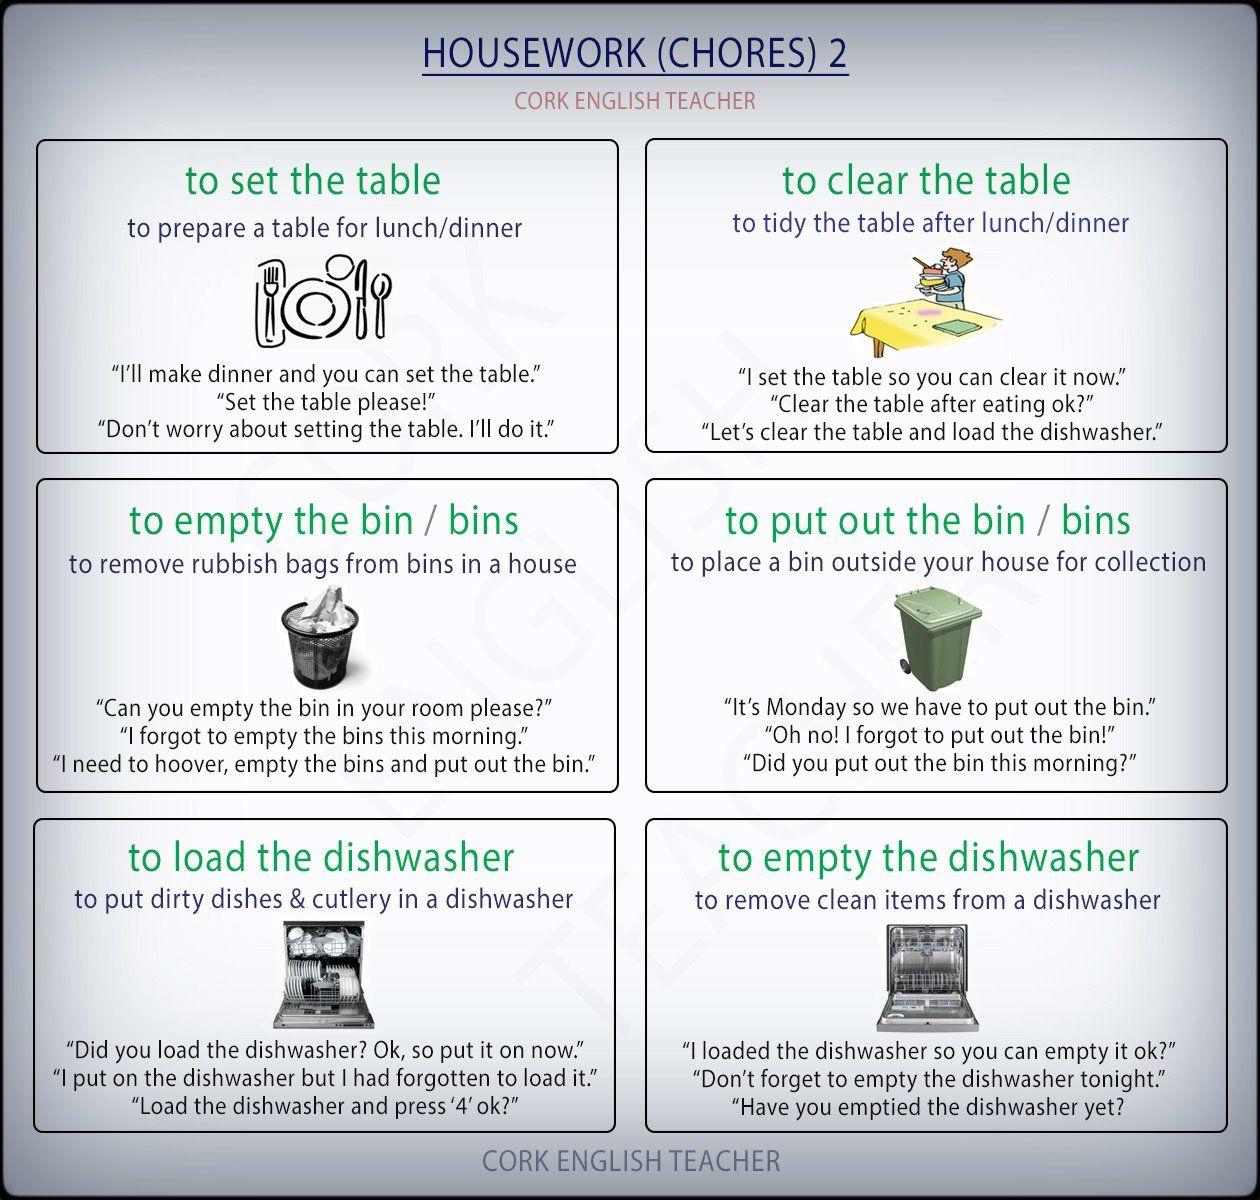 Housework Chores 2